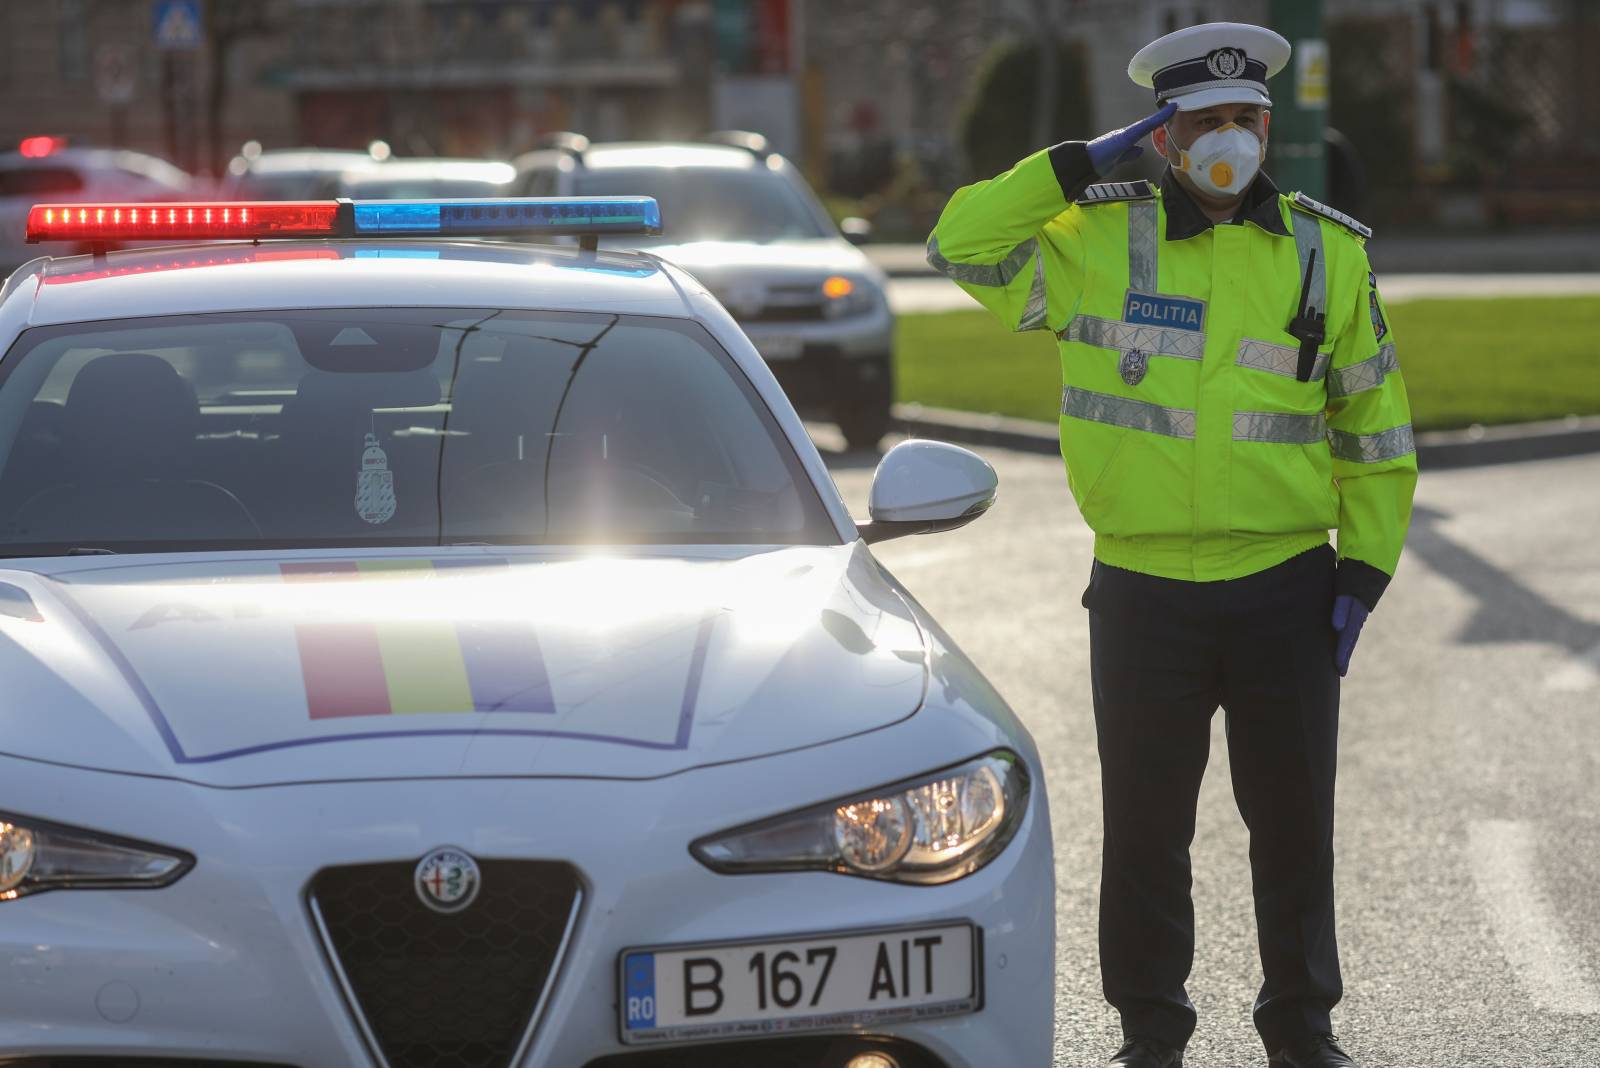 Politia Romana alcoolul sanitar farmacie